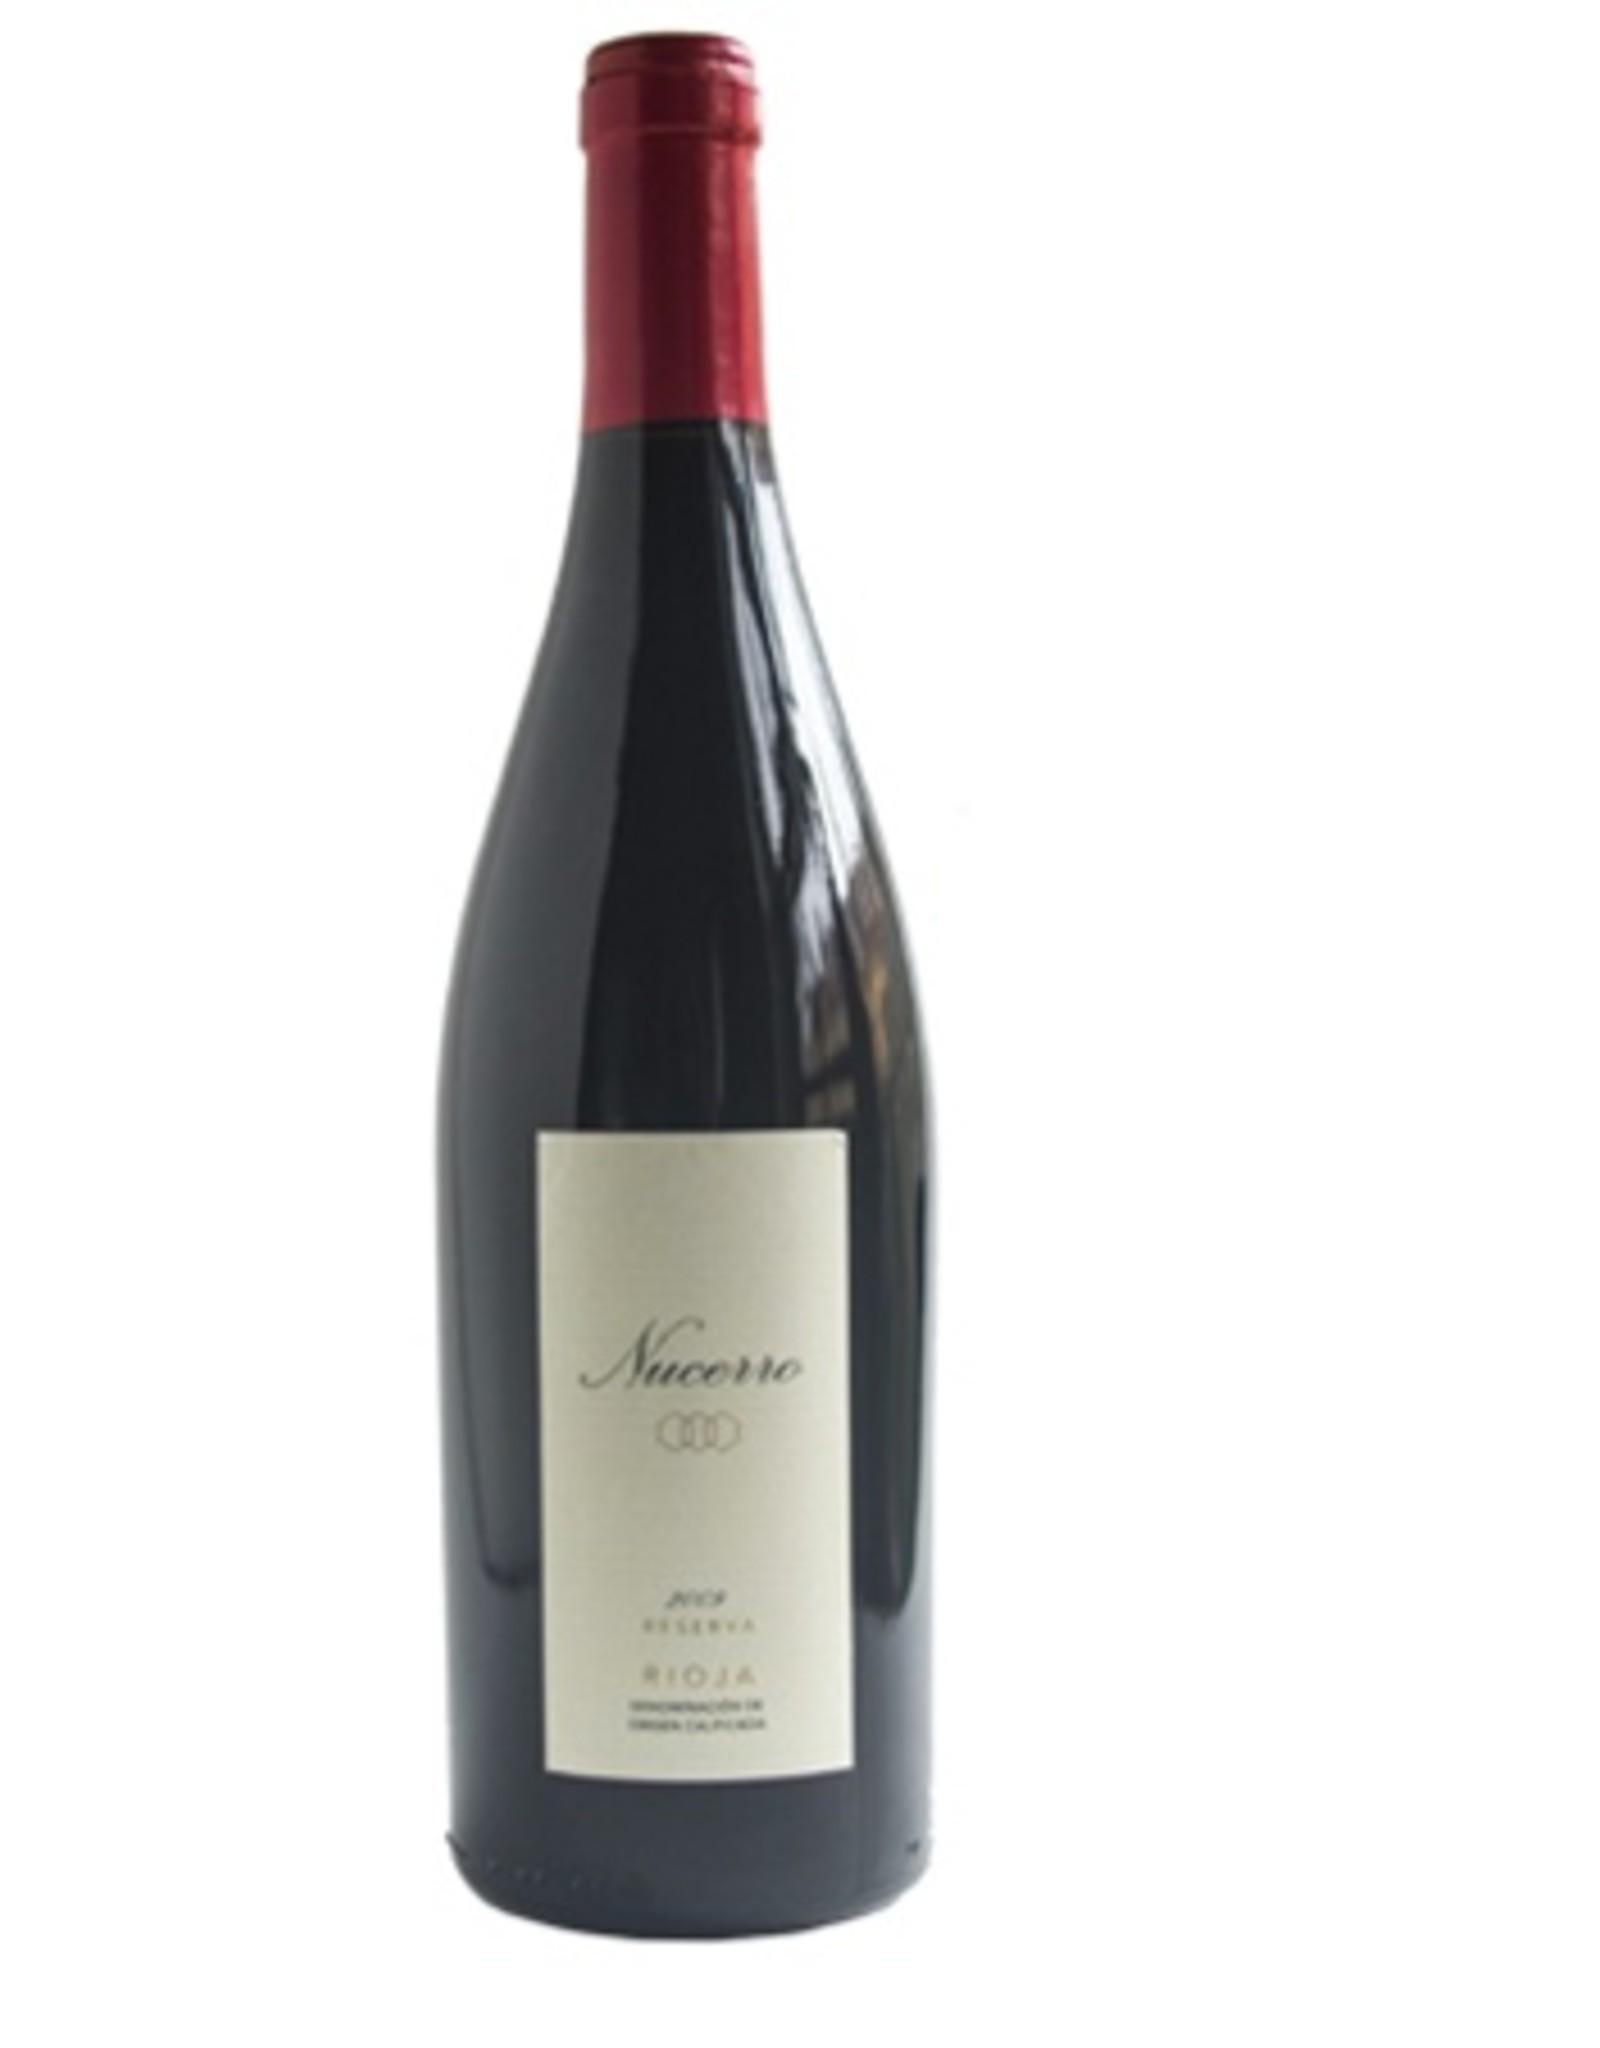 Bodegas Olarra Nucerro Rioja Reserva 2014